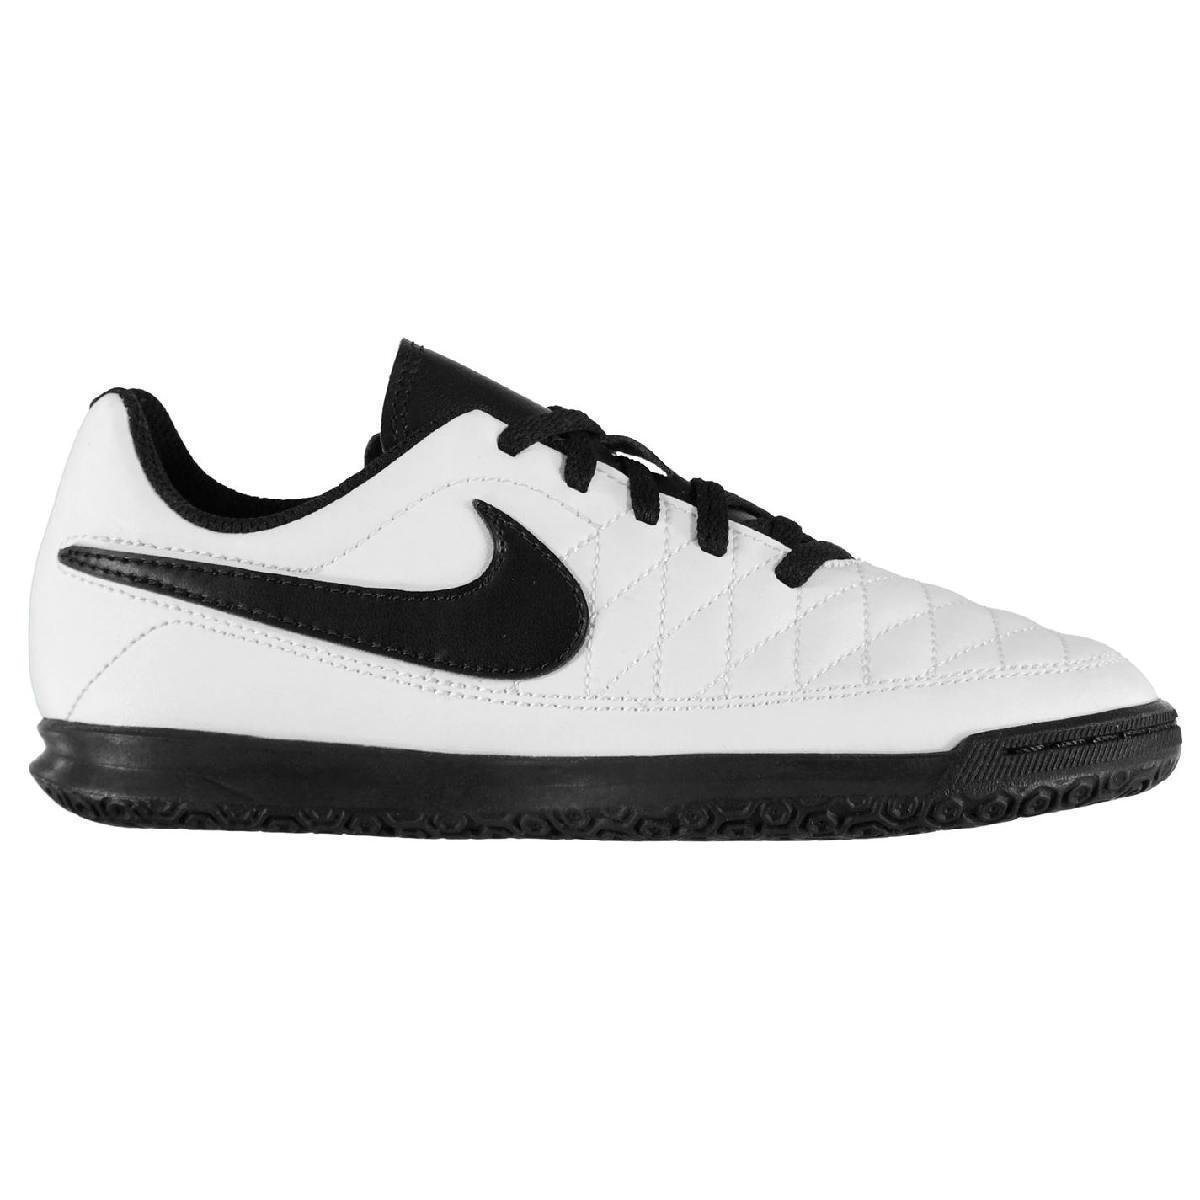 Nike Majestry IC Hallenschuhe Fußballschuhe Jungen Kinder Indoor Futsal 1110 1110 1110 61594b